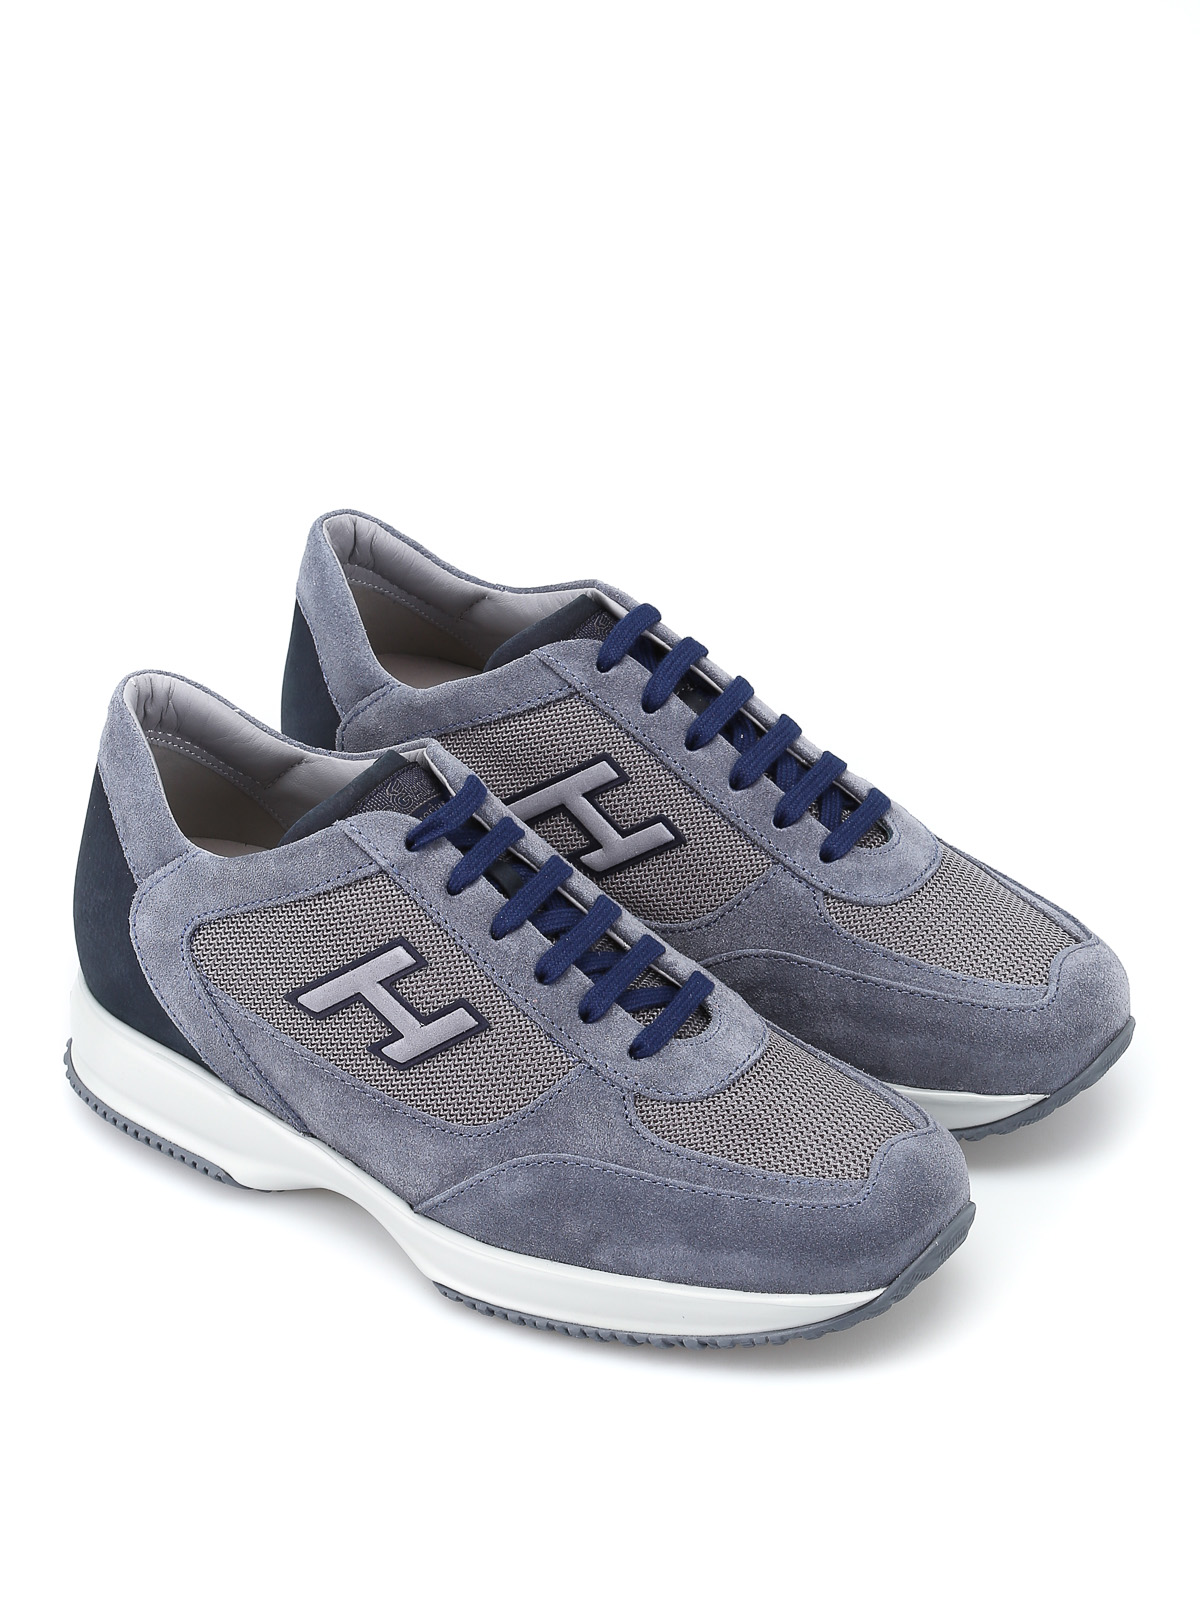 5e6ceef57a09 HOGAN  trainers online - New Interactive H Flock blue shoes